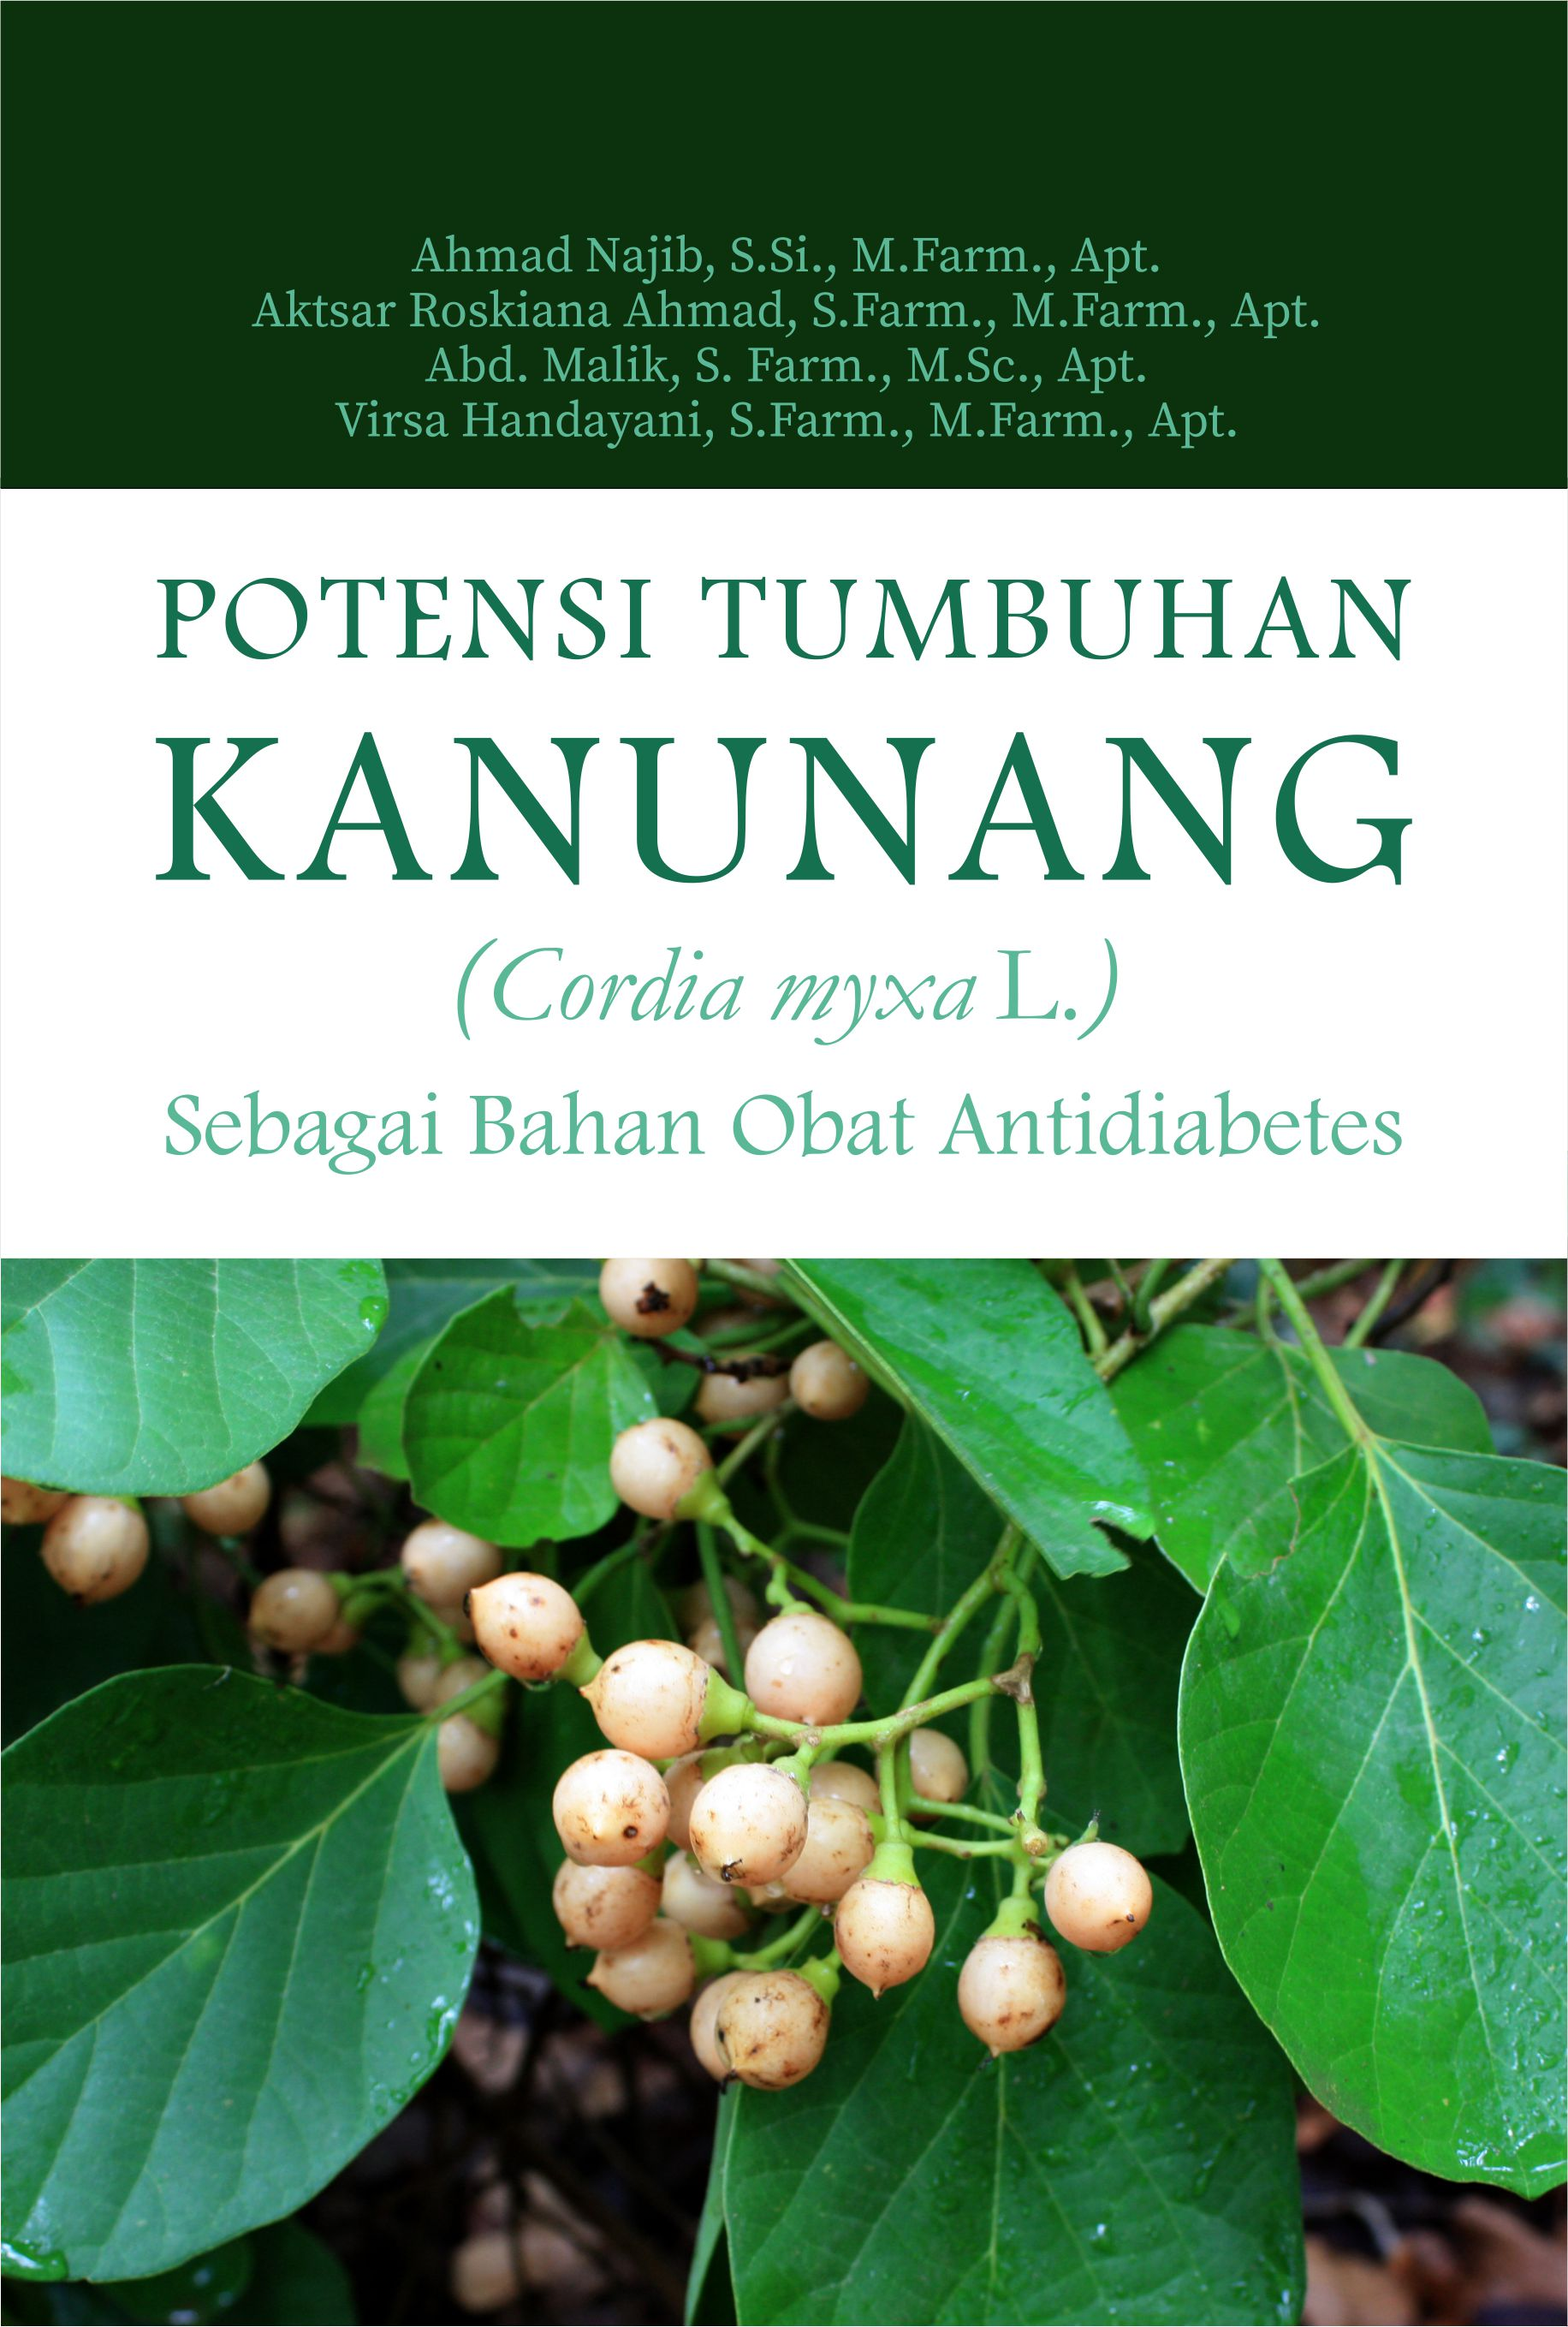 Potensi tumbuhan kanunang (cordia myxa l.) sebagai bahan obat antidiabetes [sumber elektronis]